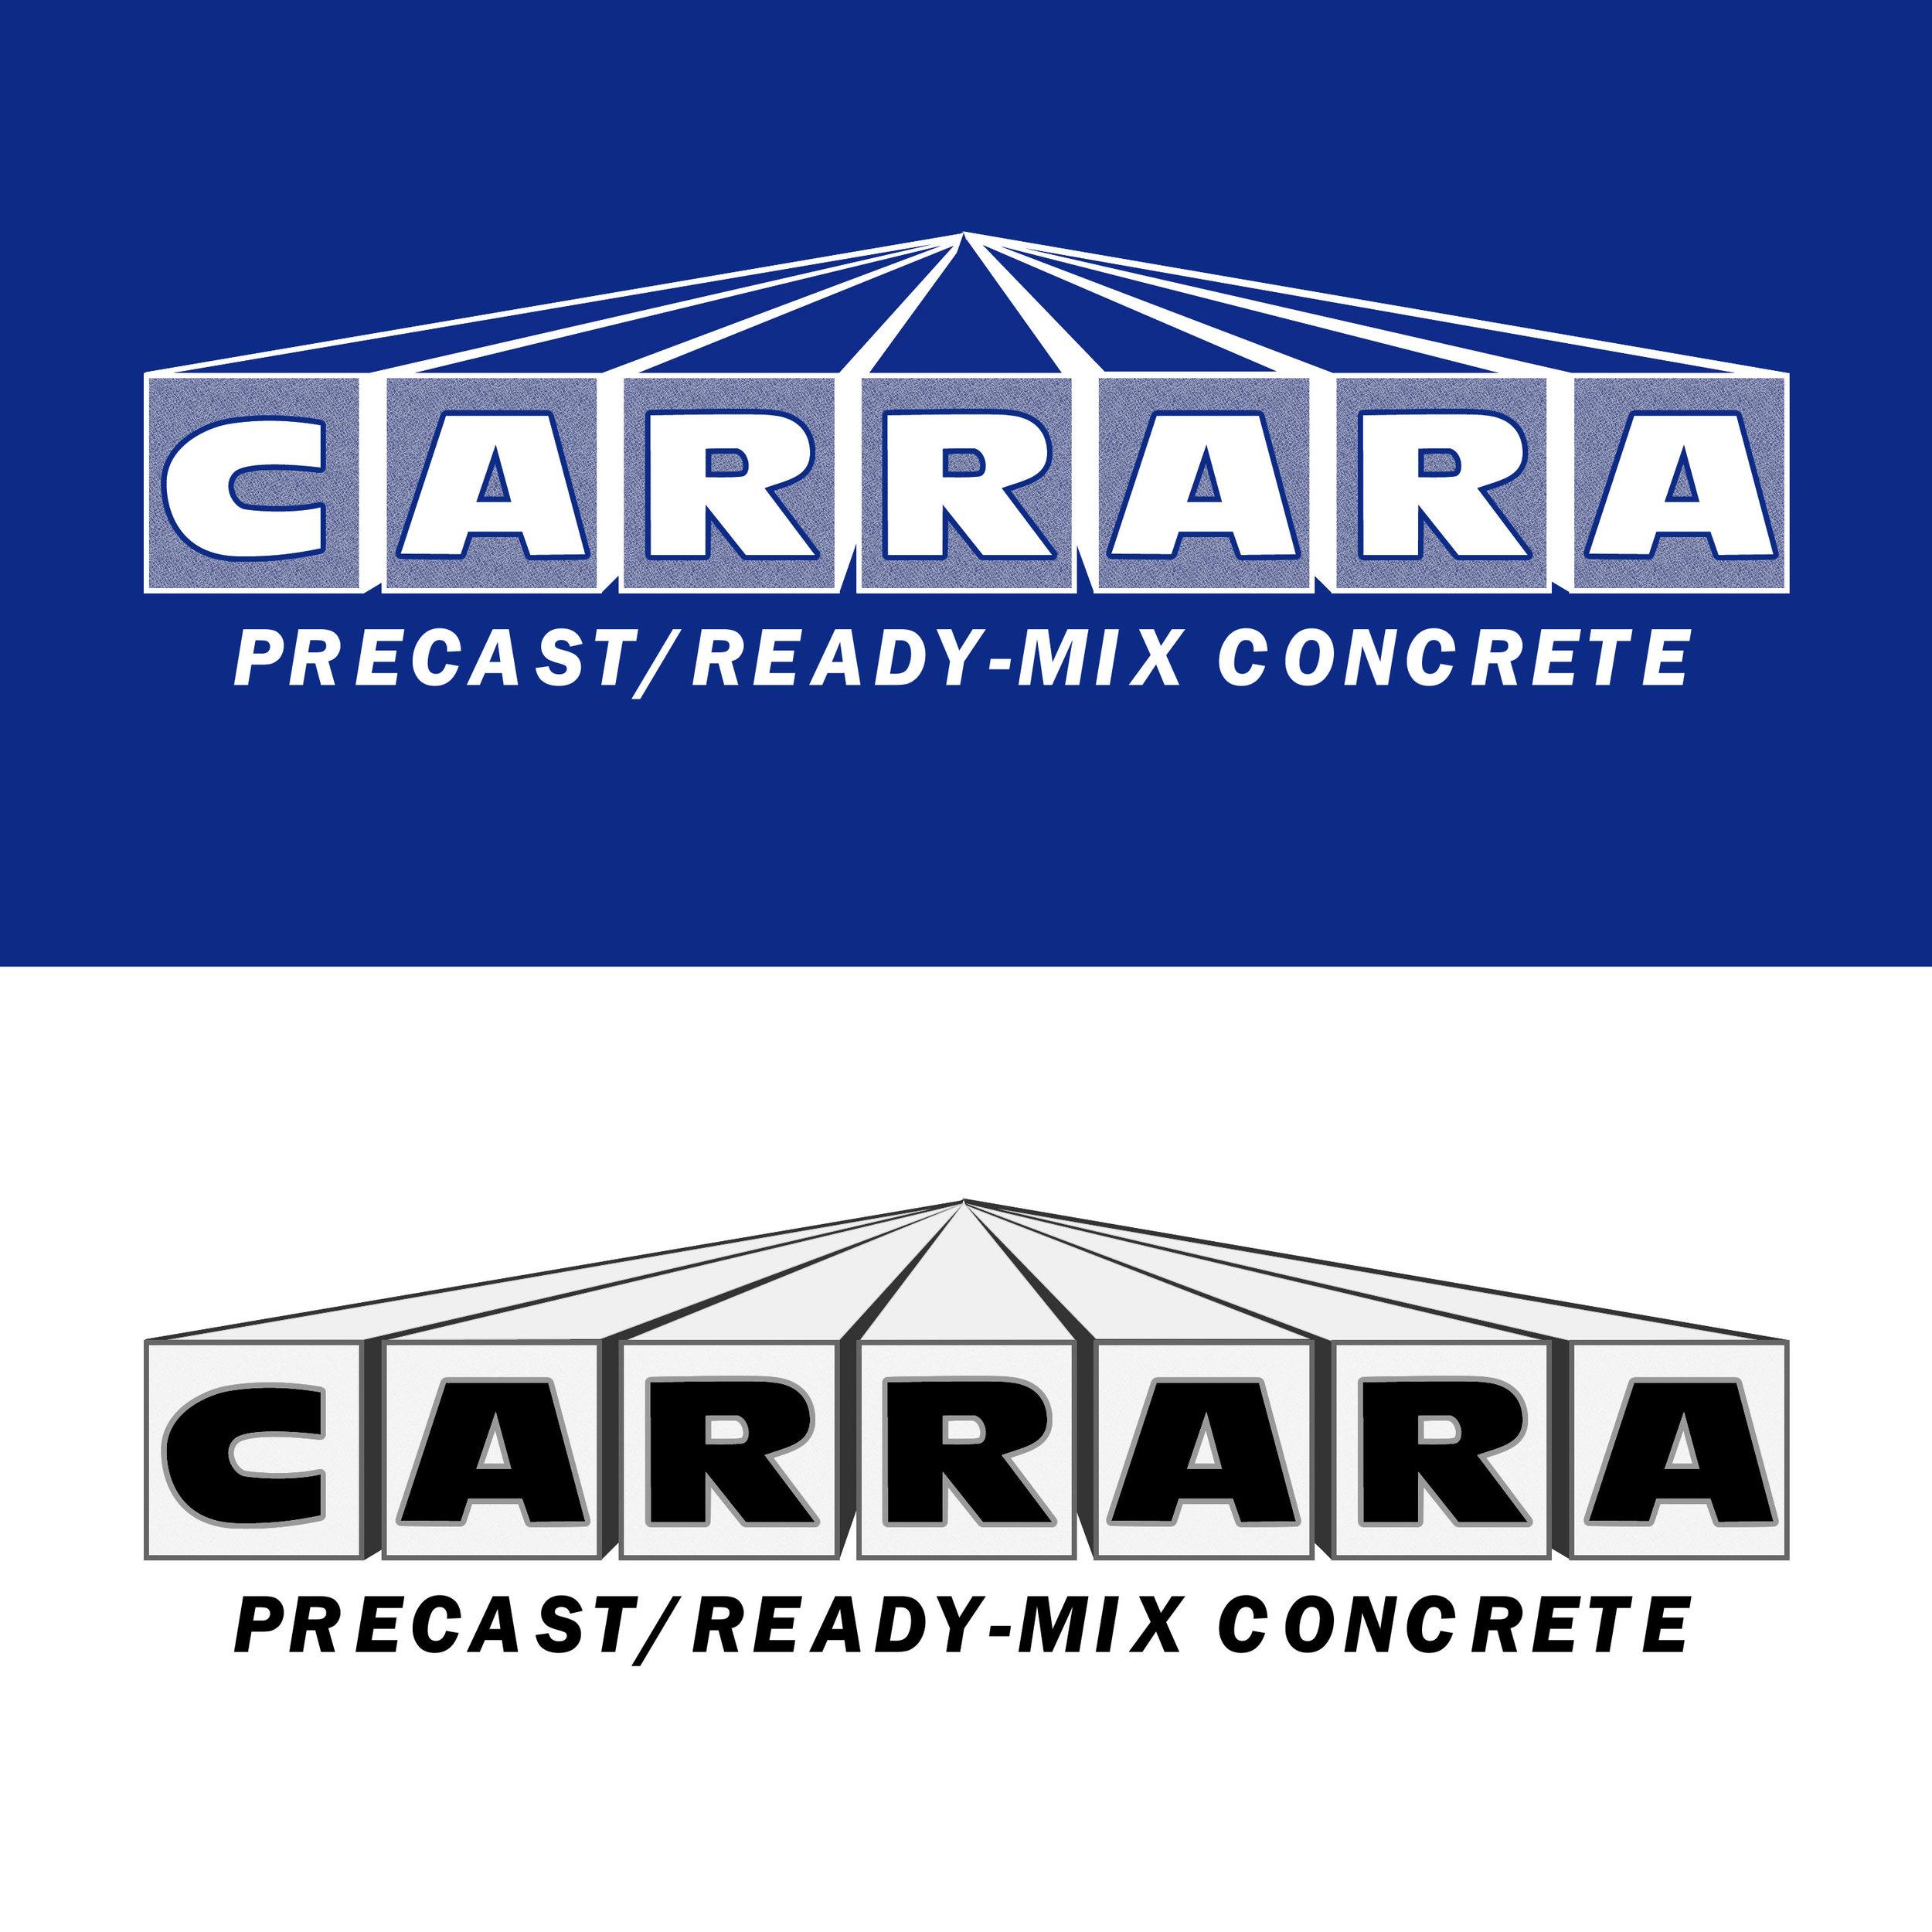 Carrara Logo, 2009 Mar.jpg